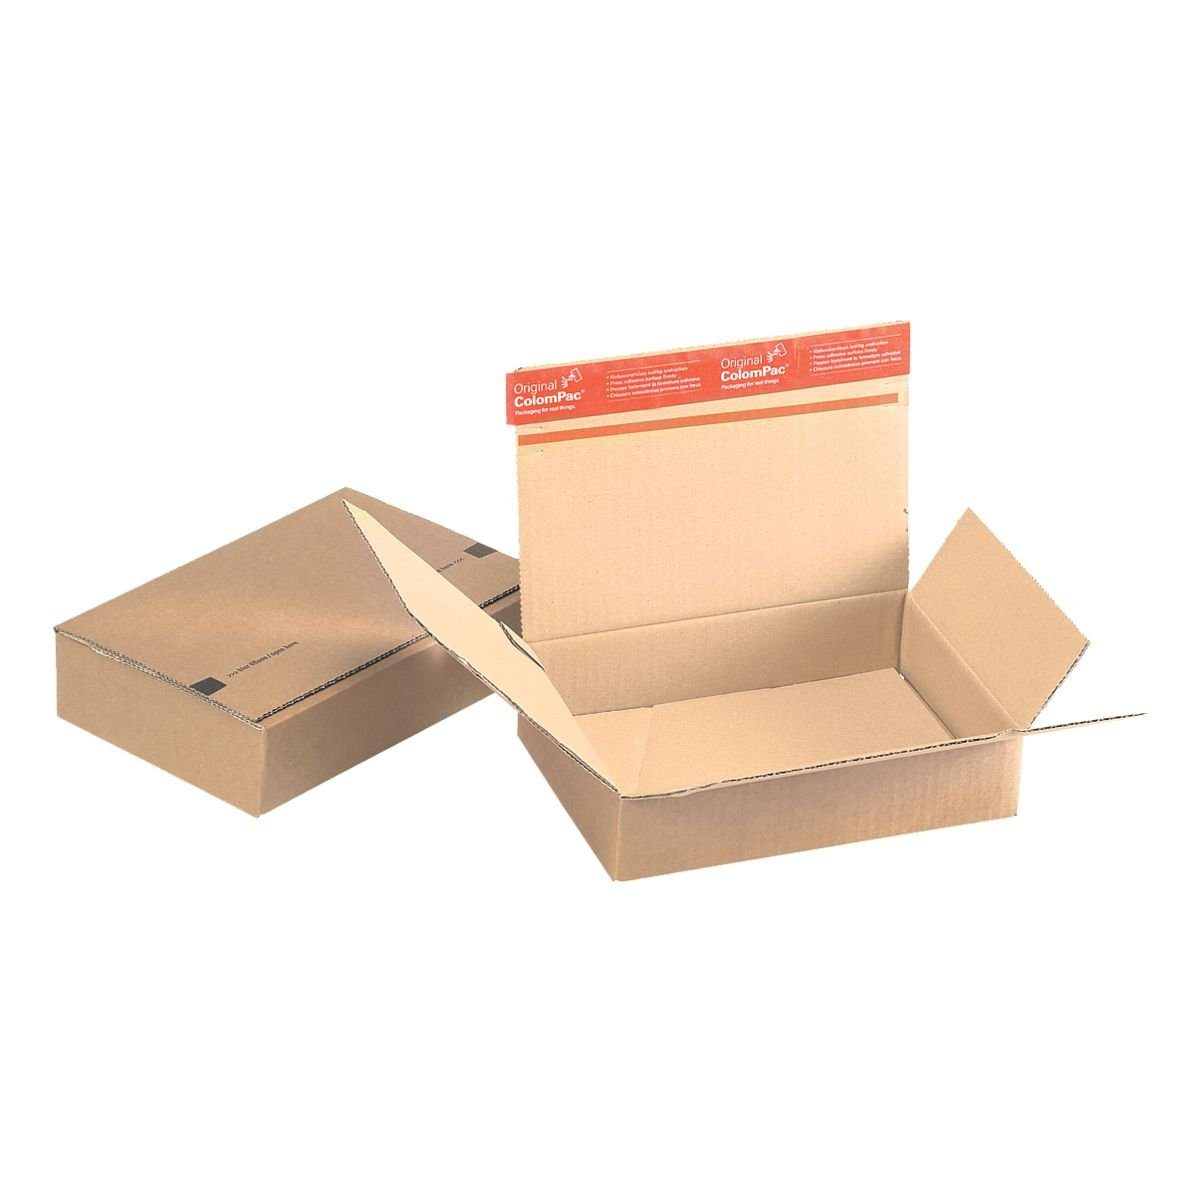 COLOMPAC Blitzbodenkartons 16,0/23,0/5,0 cm